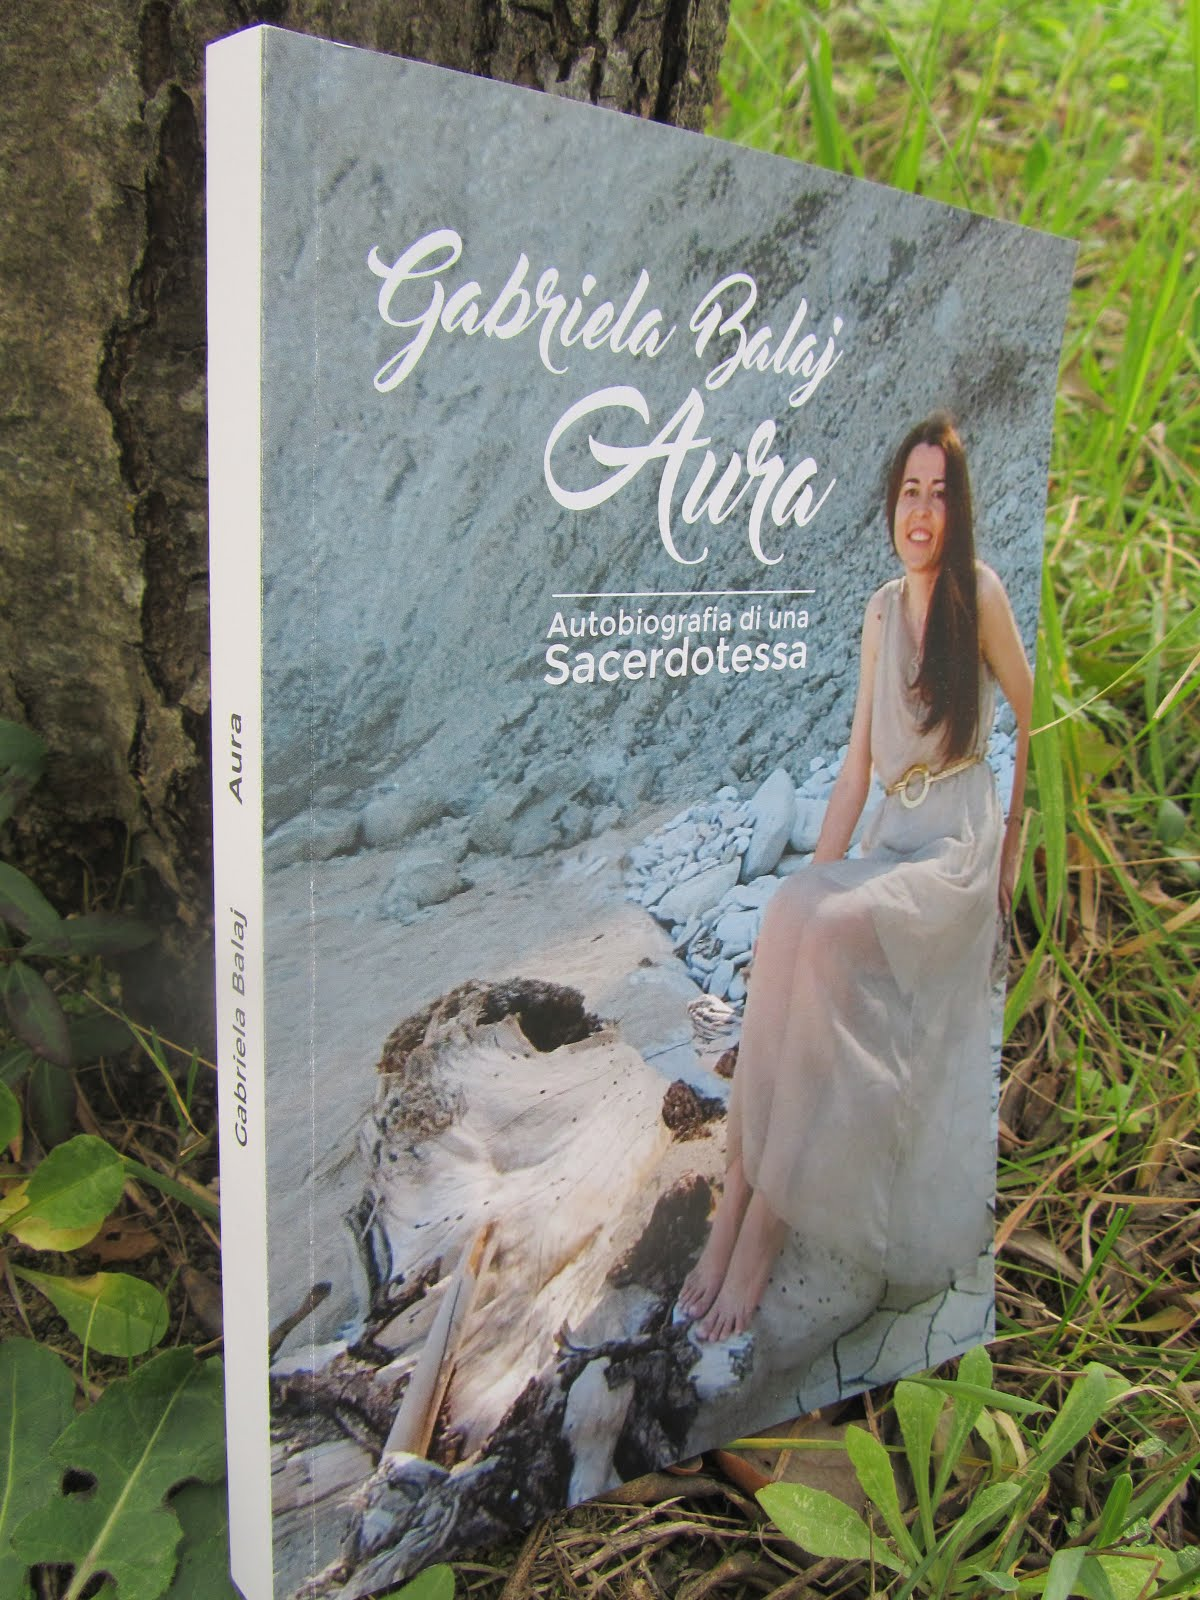 """Aura. Autobiografia di una Sacerdotessa"""